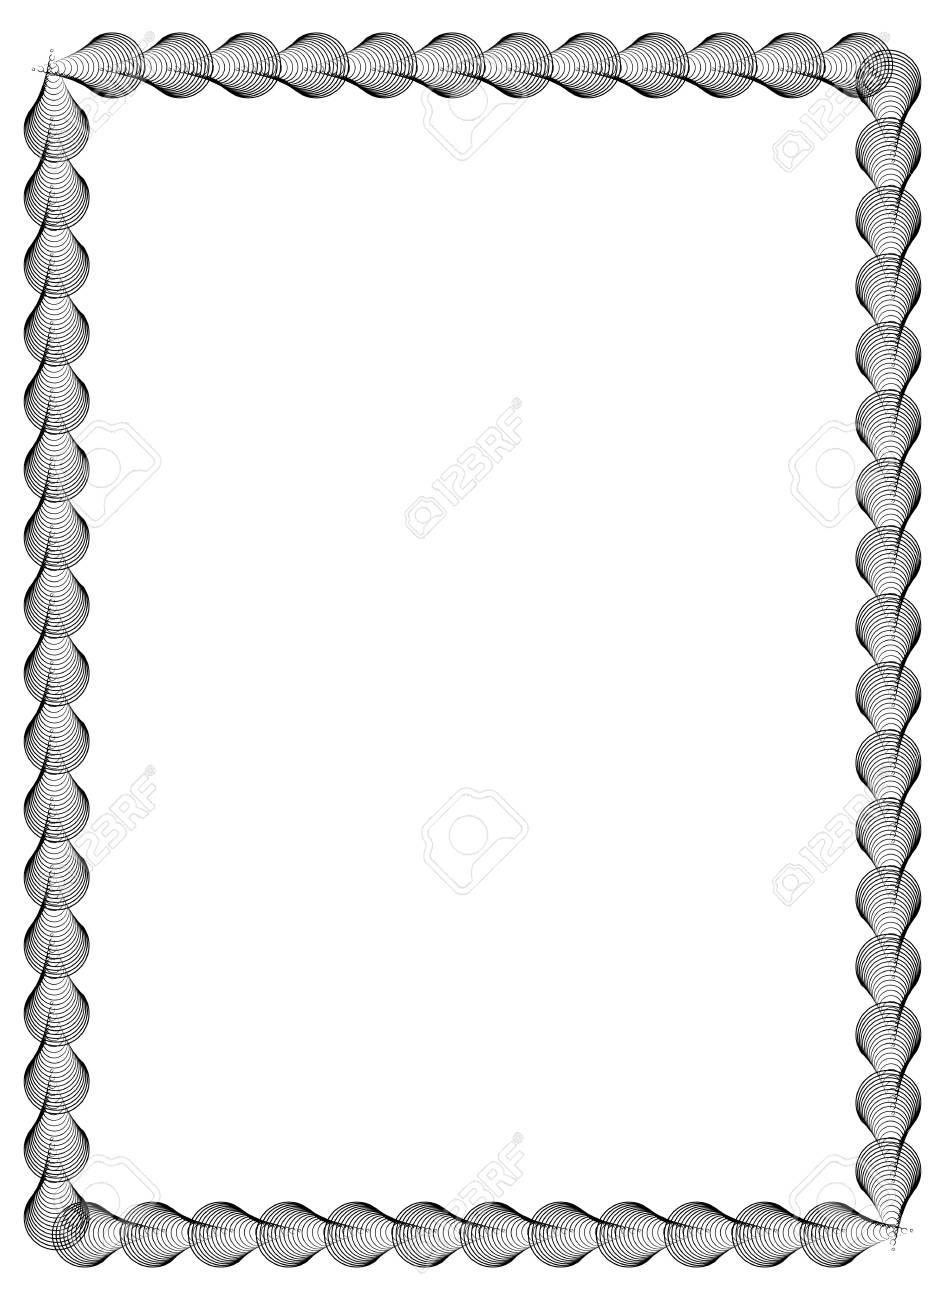 Charmant Weißmetallbettrahmen Voll Fotos - Rahmen Ideen ...